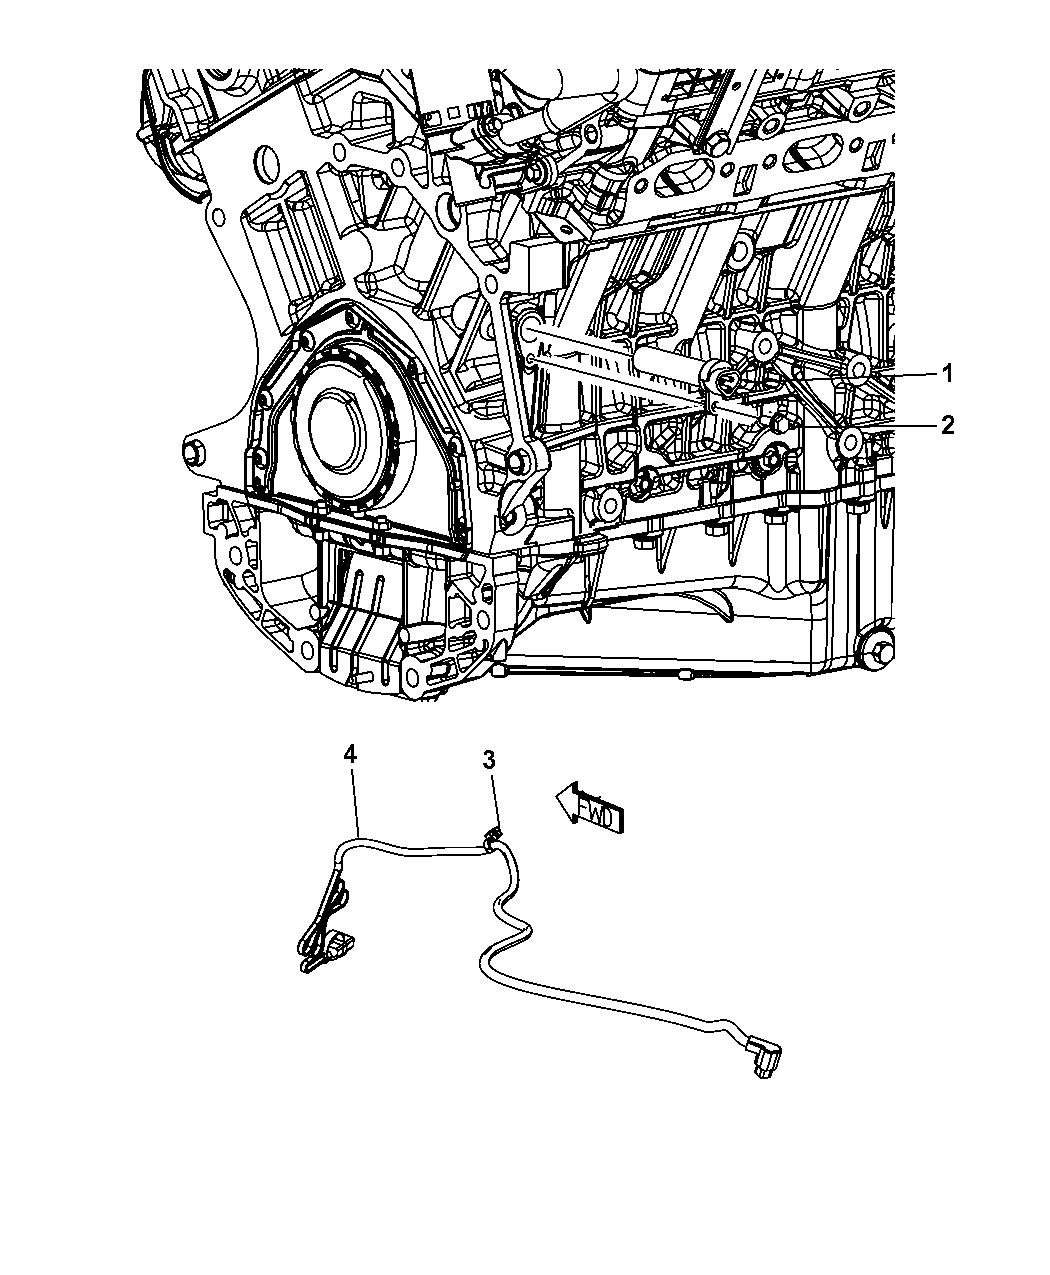 2009 Dodge Journey Engine Cylinder Block Heater - Thumbnail 4